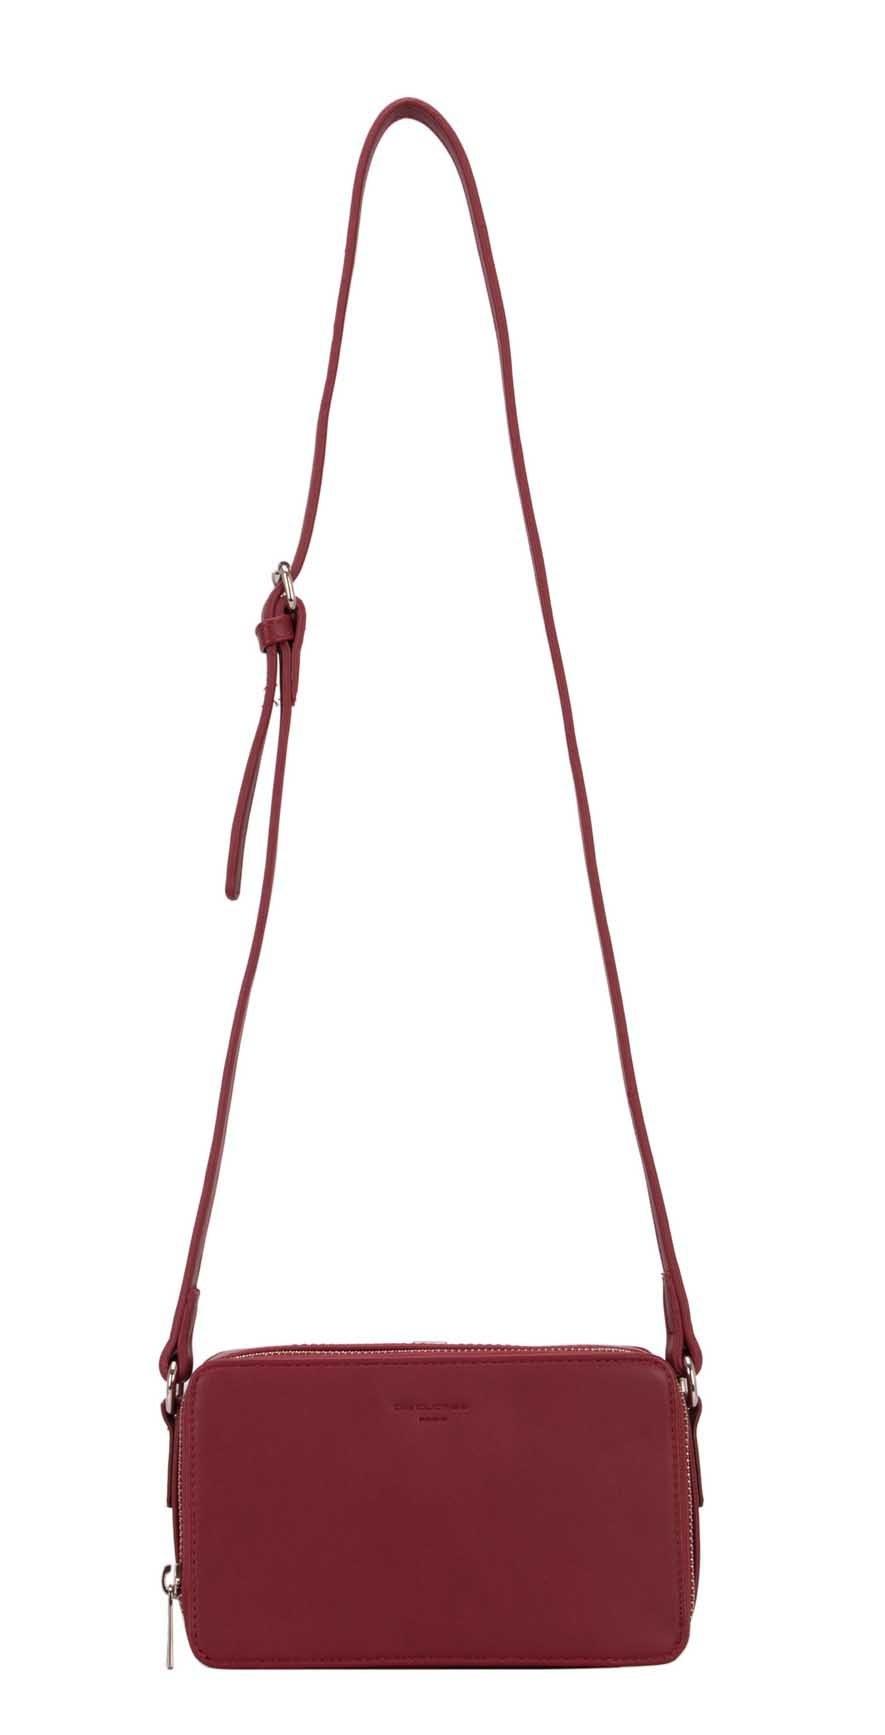 Handbag Shoulder Bag Tote